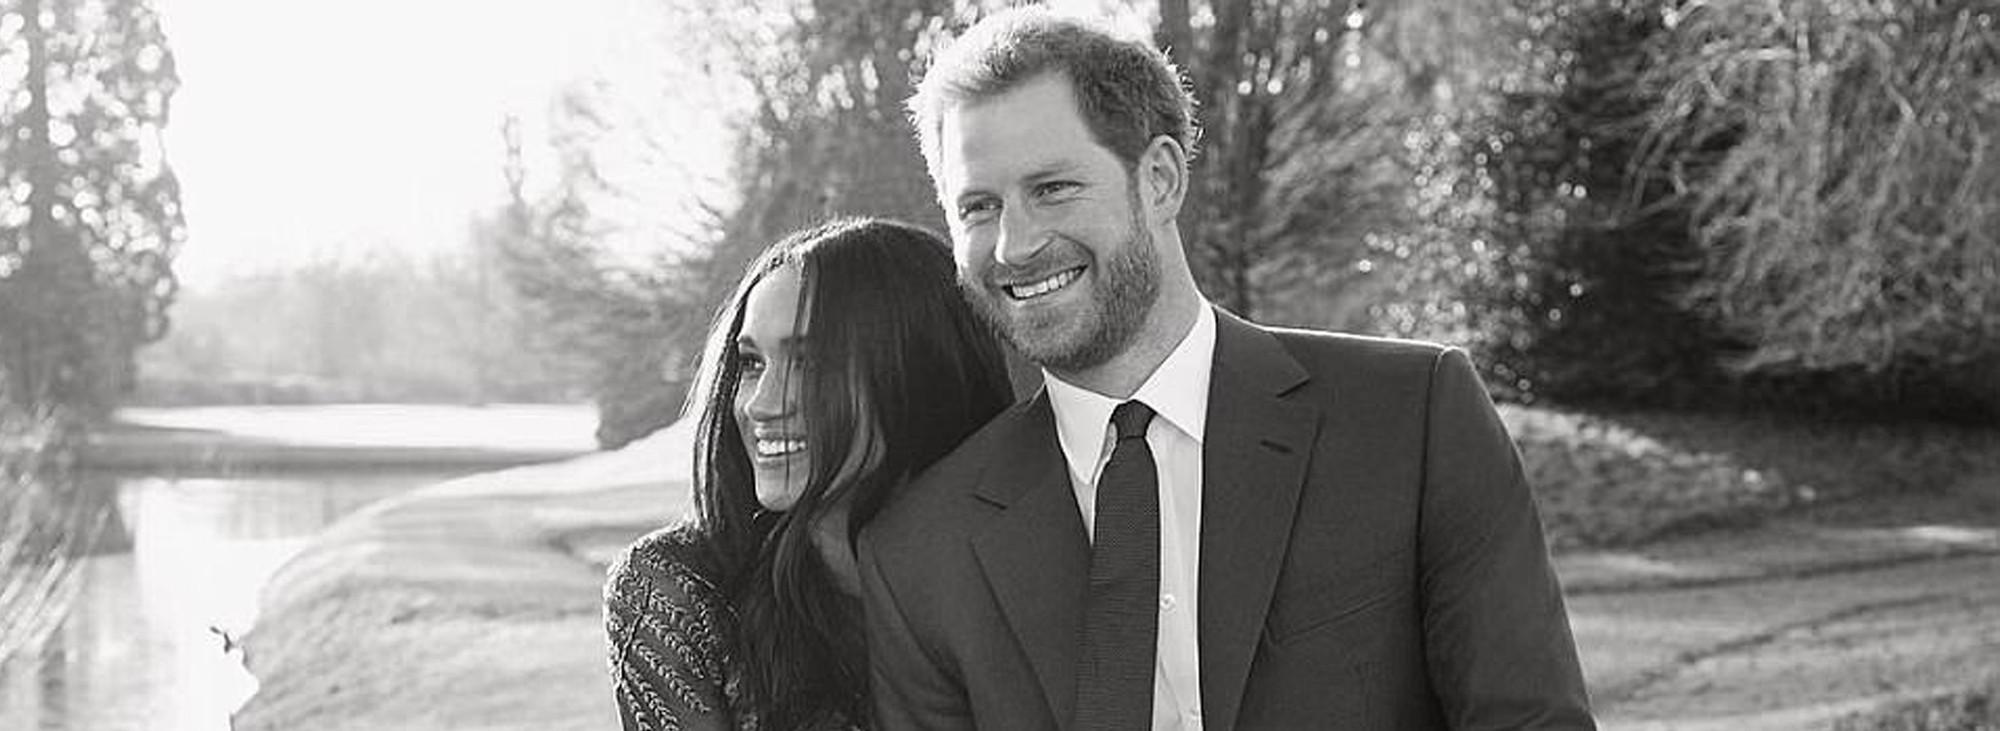 Wedding Season | Royal Wedding